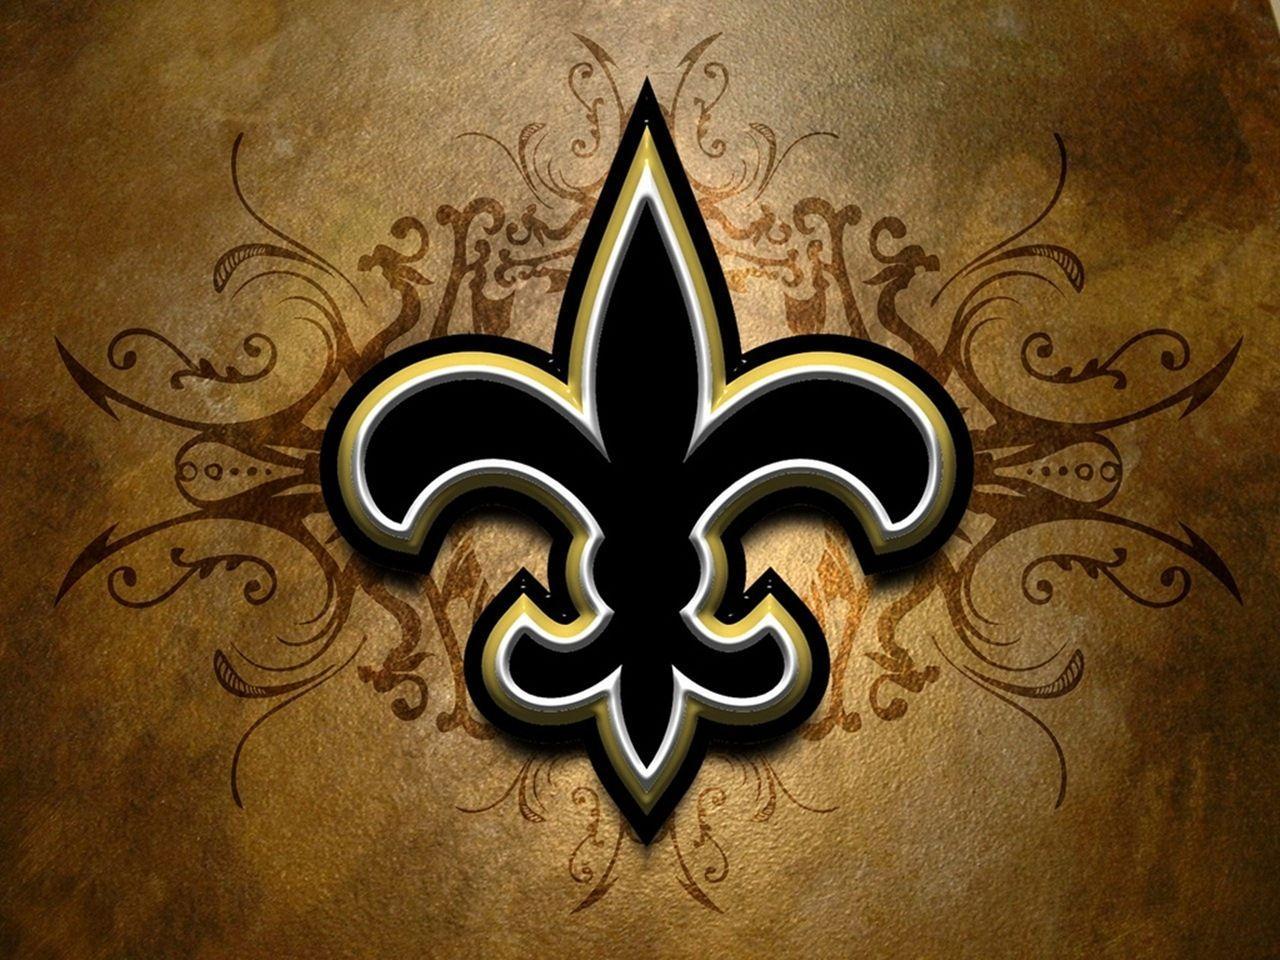 New Orleans Saints Wallpapers Wallpaper Cave